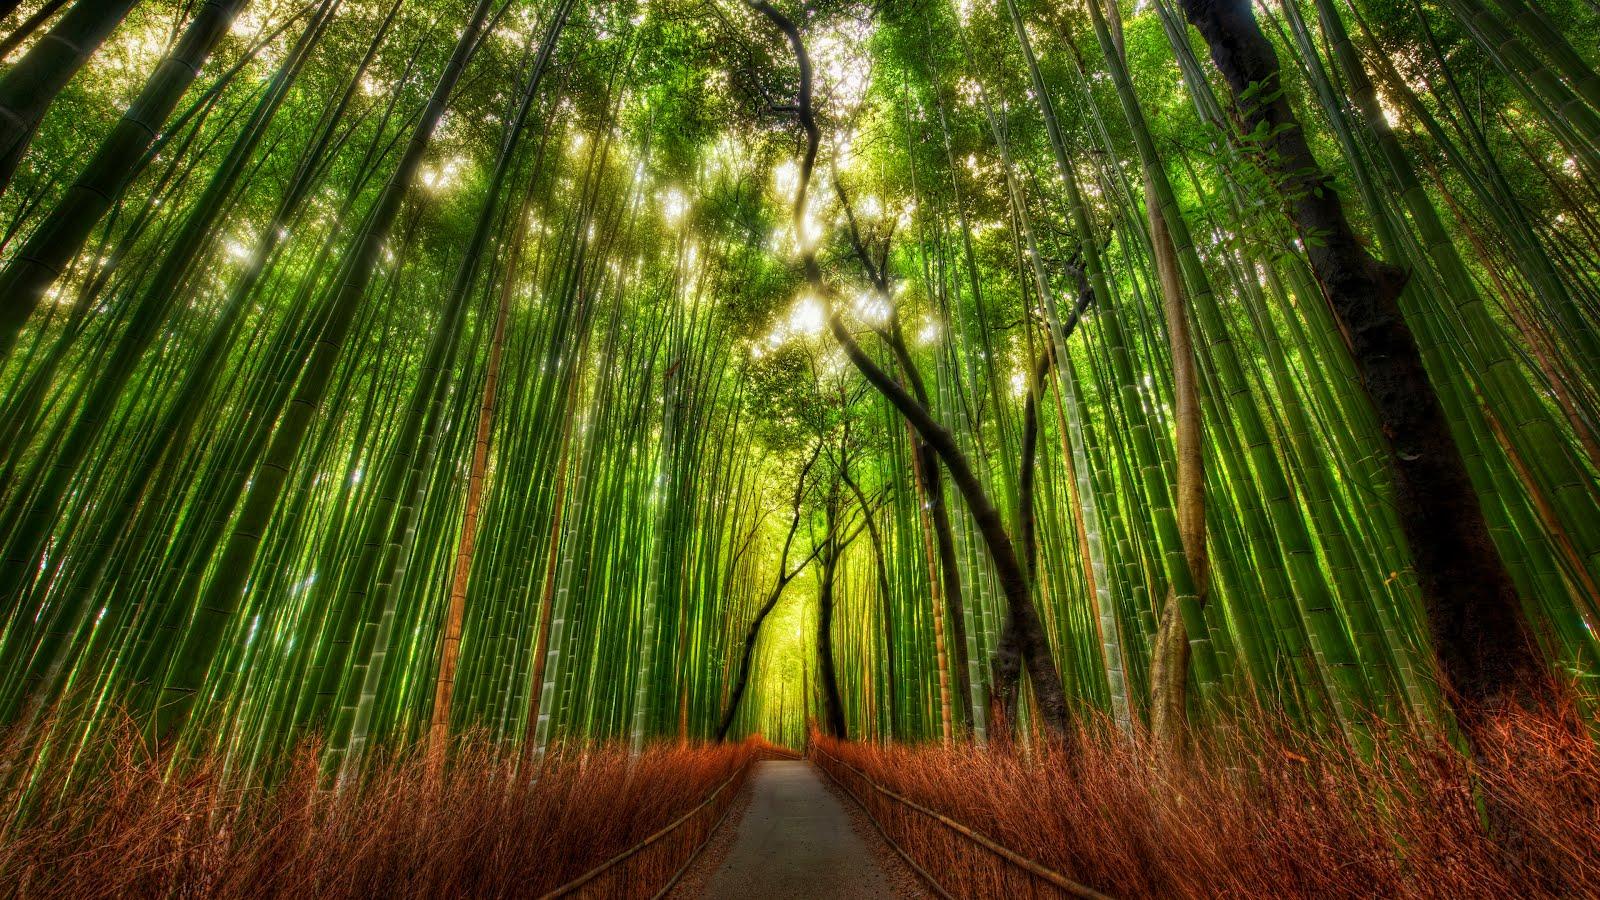 http://3.bp.blogspot.com/-hiEO_o6fXR8/T1e5VrwnxFI/AAAAAAAAEbc/5ZbDmWZ-w74/s1600/Bamboo-Forest1-3840x2160.jpg